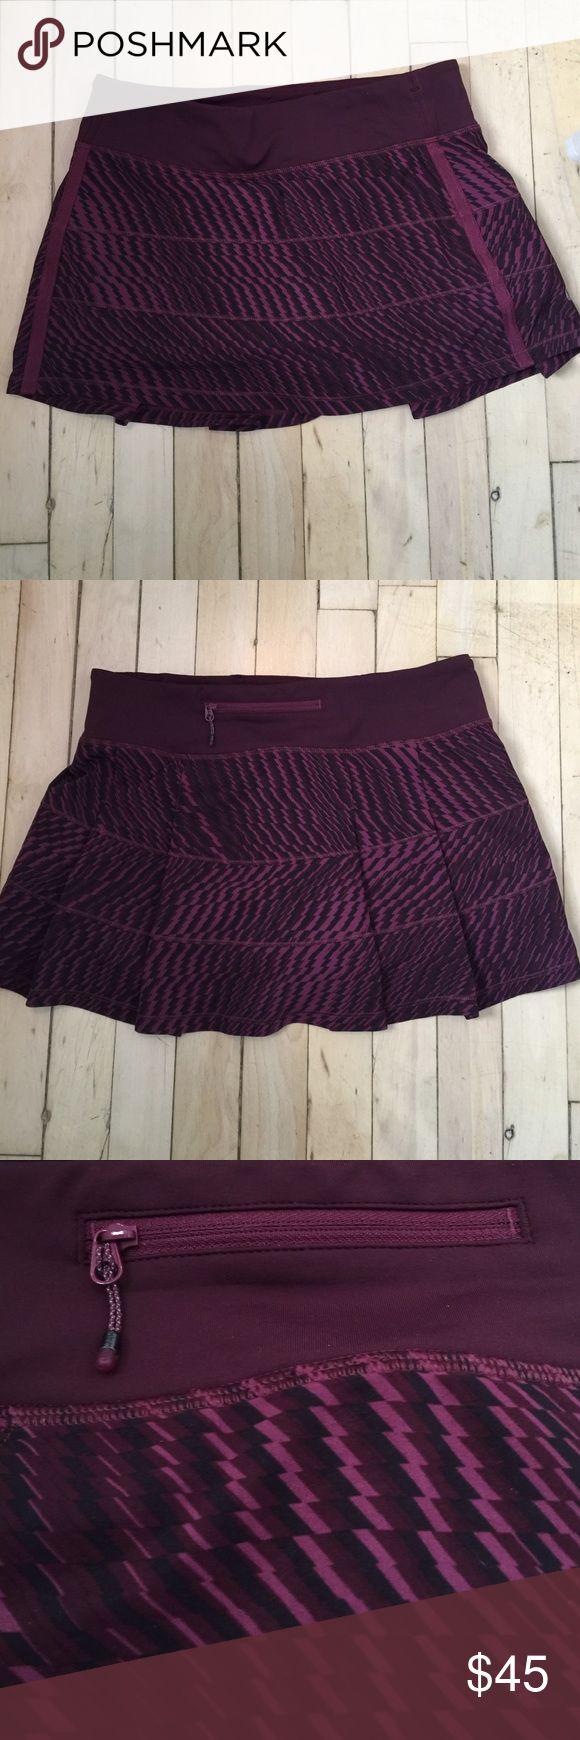 Lululemon athletica skirt Lululemon athletica skirt - worn once... size 6Reg.... color is burgundy and black lululemon athletica Other